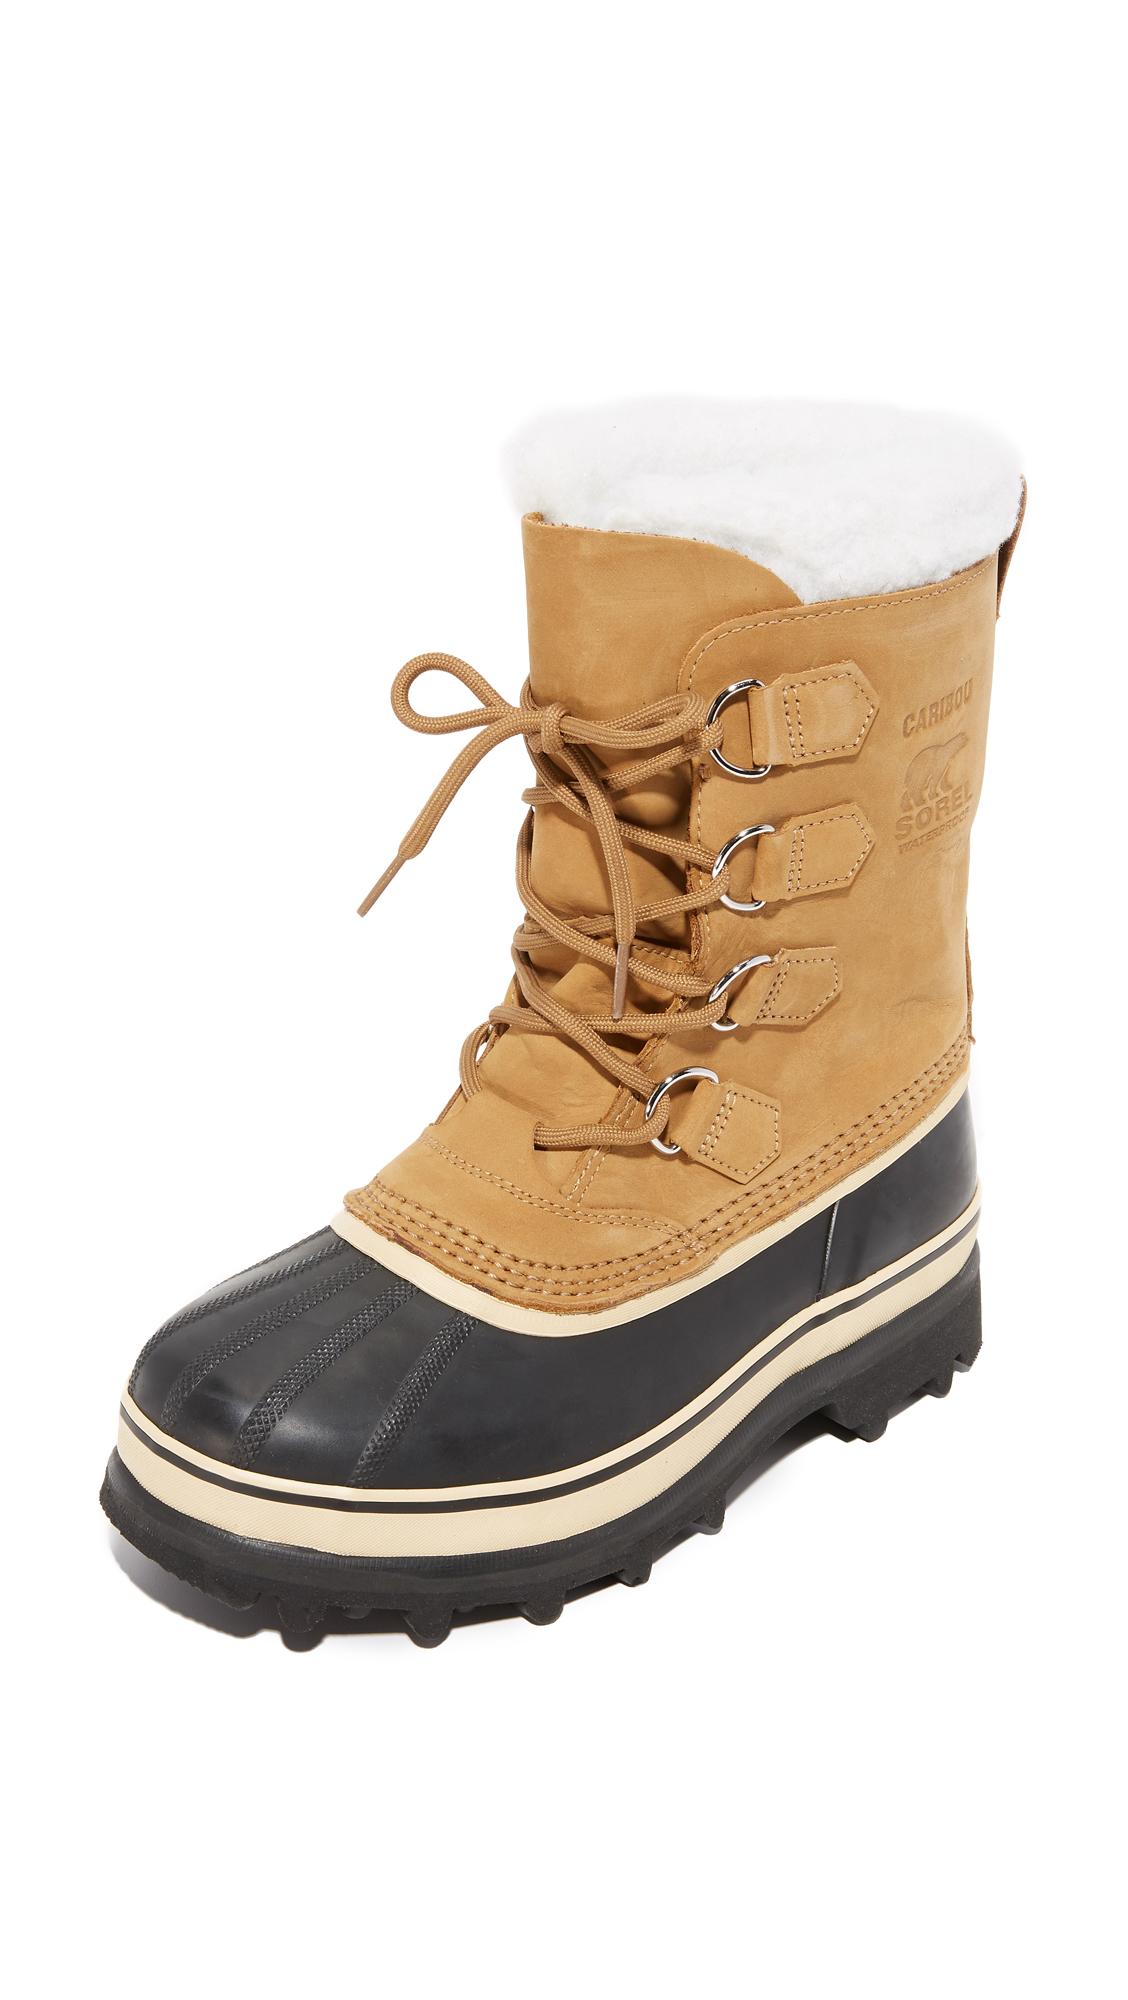 Photo of Sorel Caribou Boots Buff - Sorel online